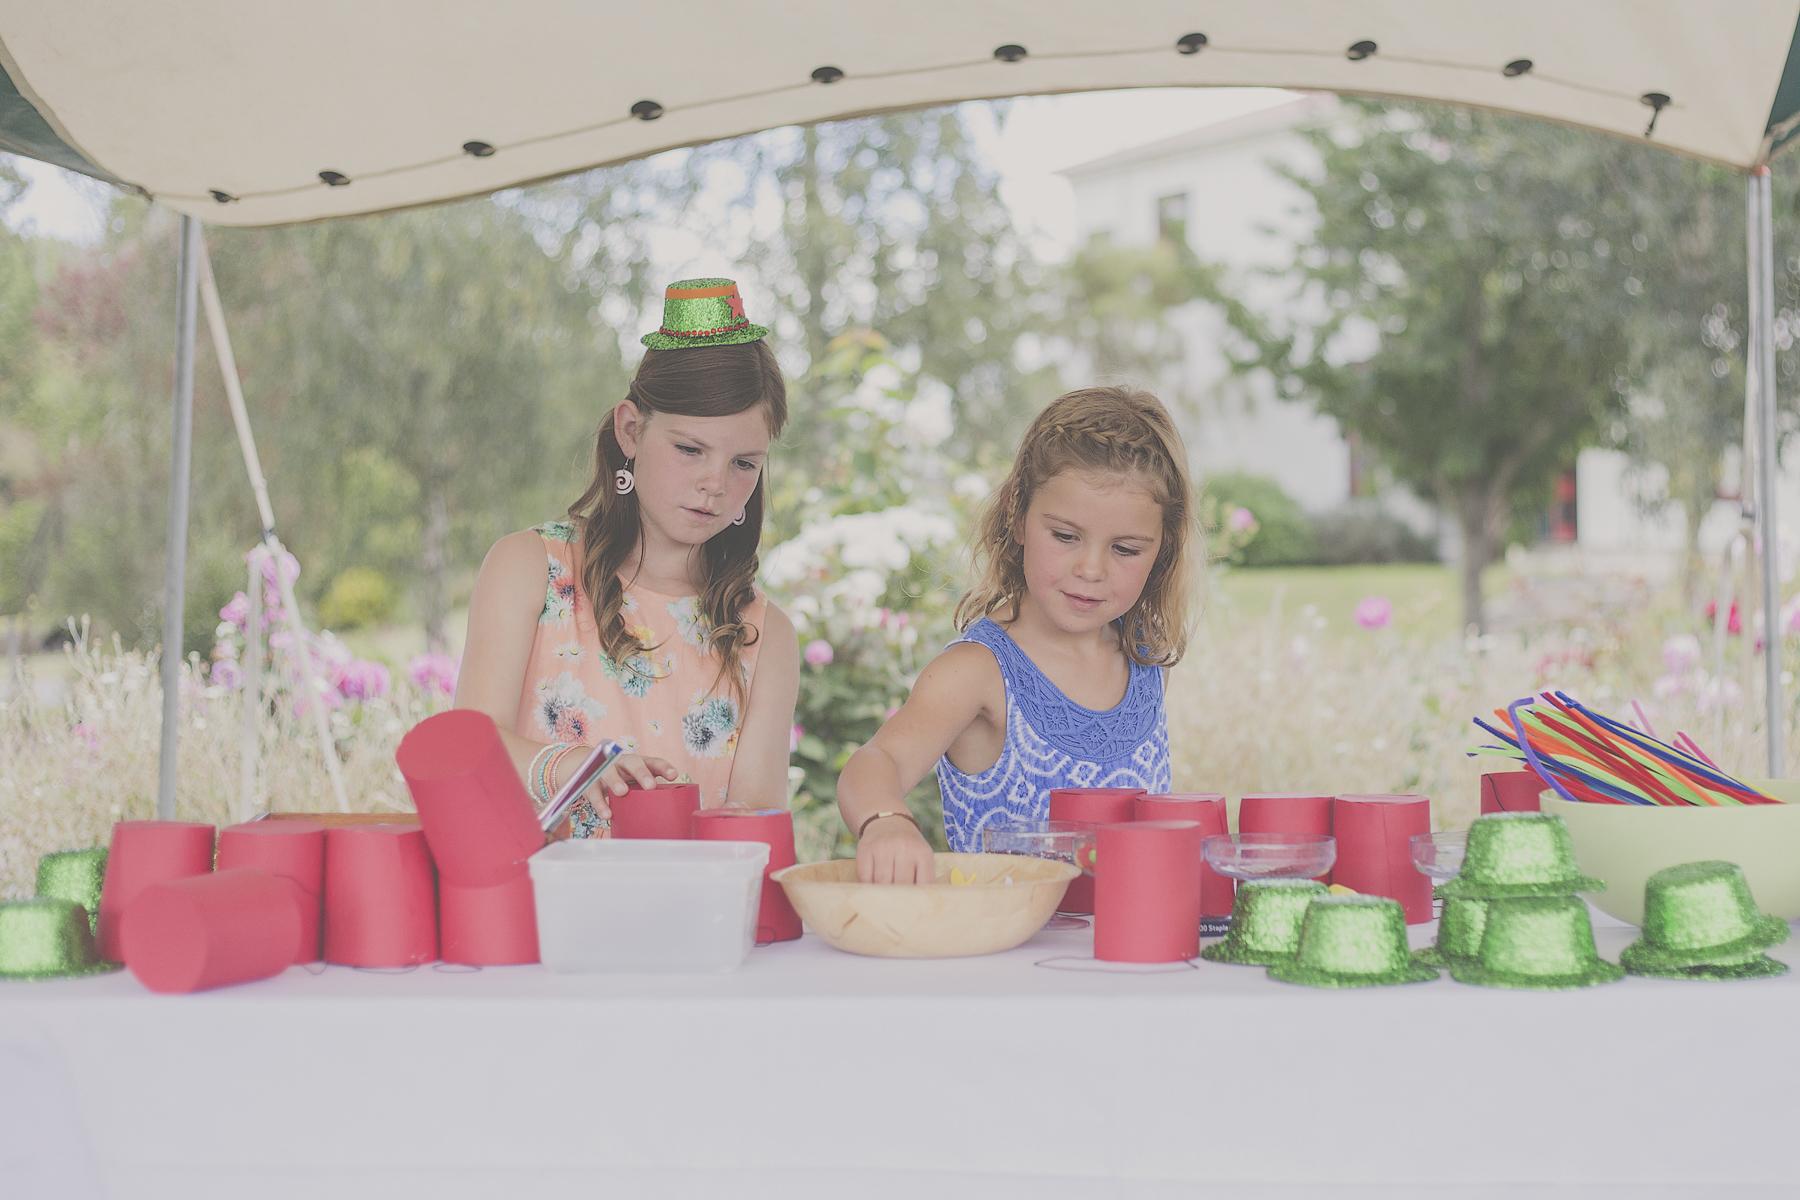 Kids at wedding. Photography by Jenny Siaosi.